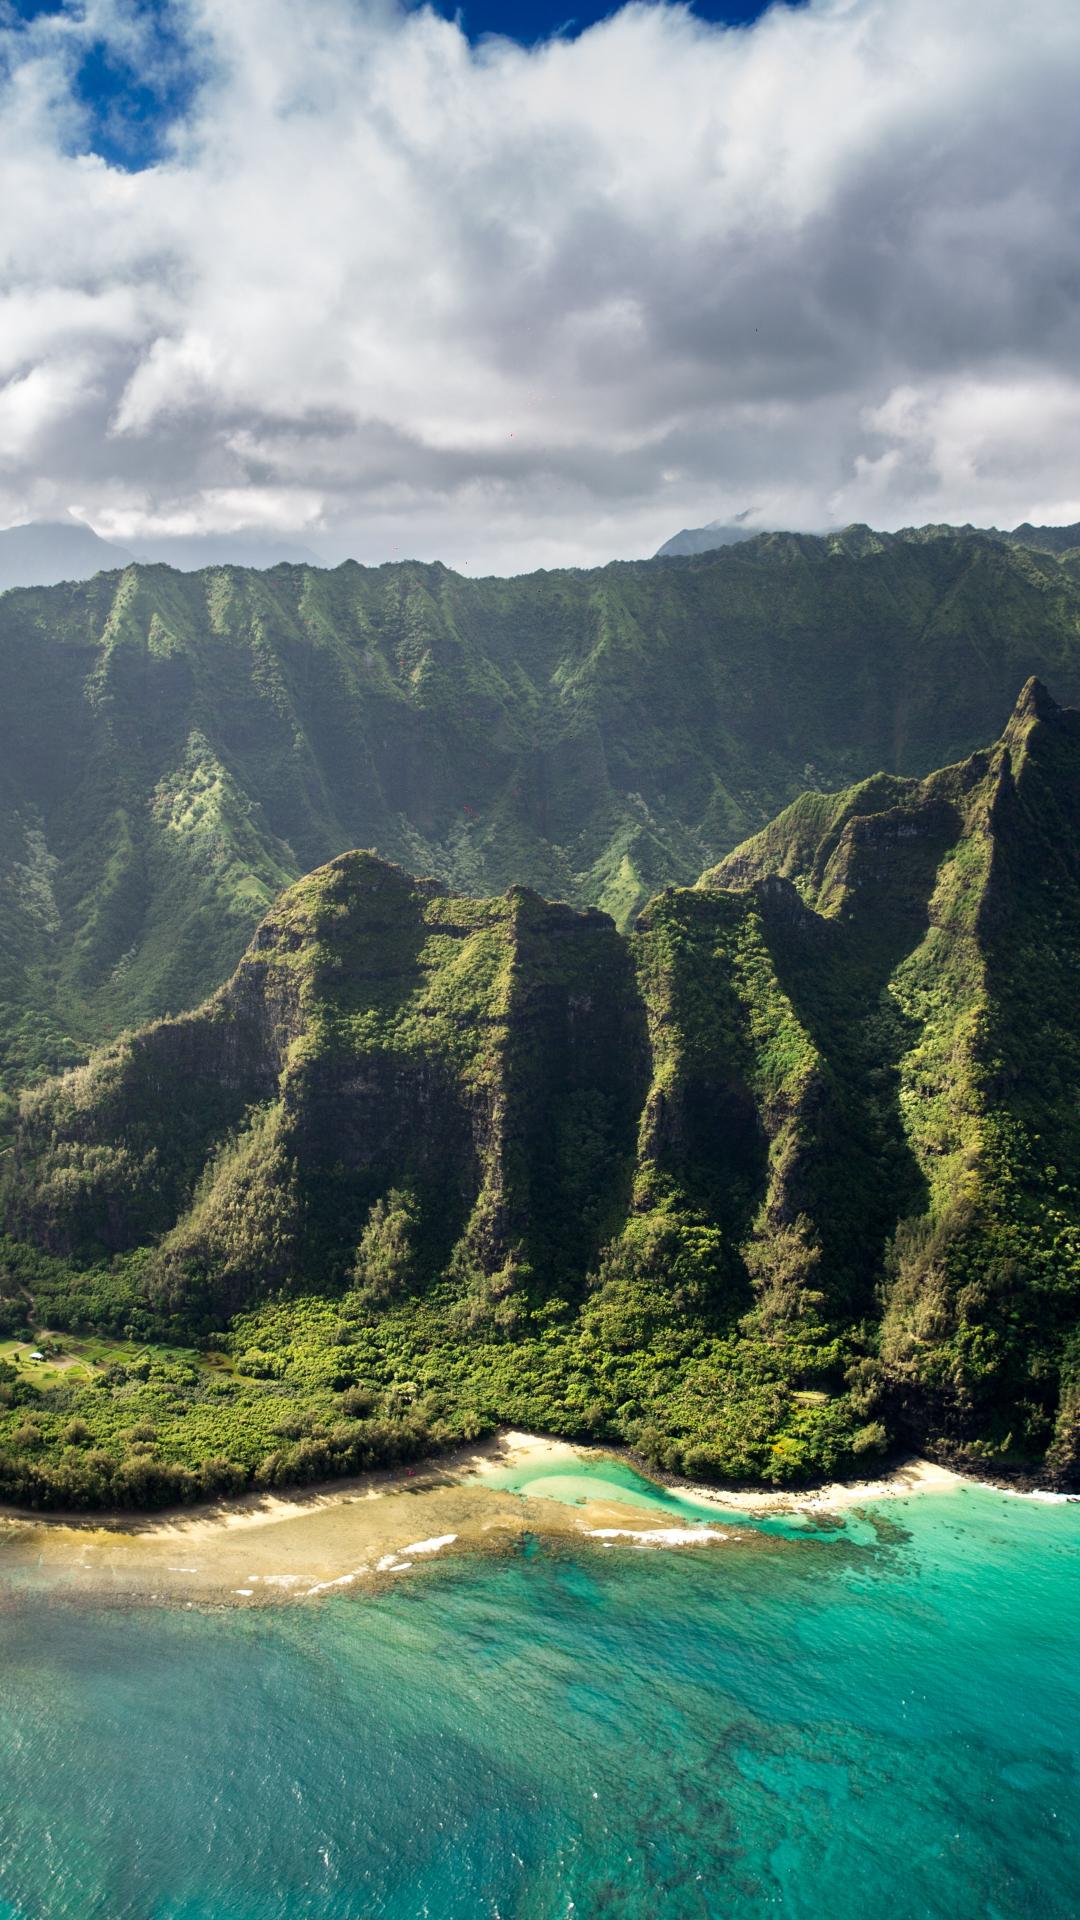 Kauai iPhone Wallpaper iDrop News 1080x1920